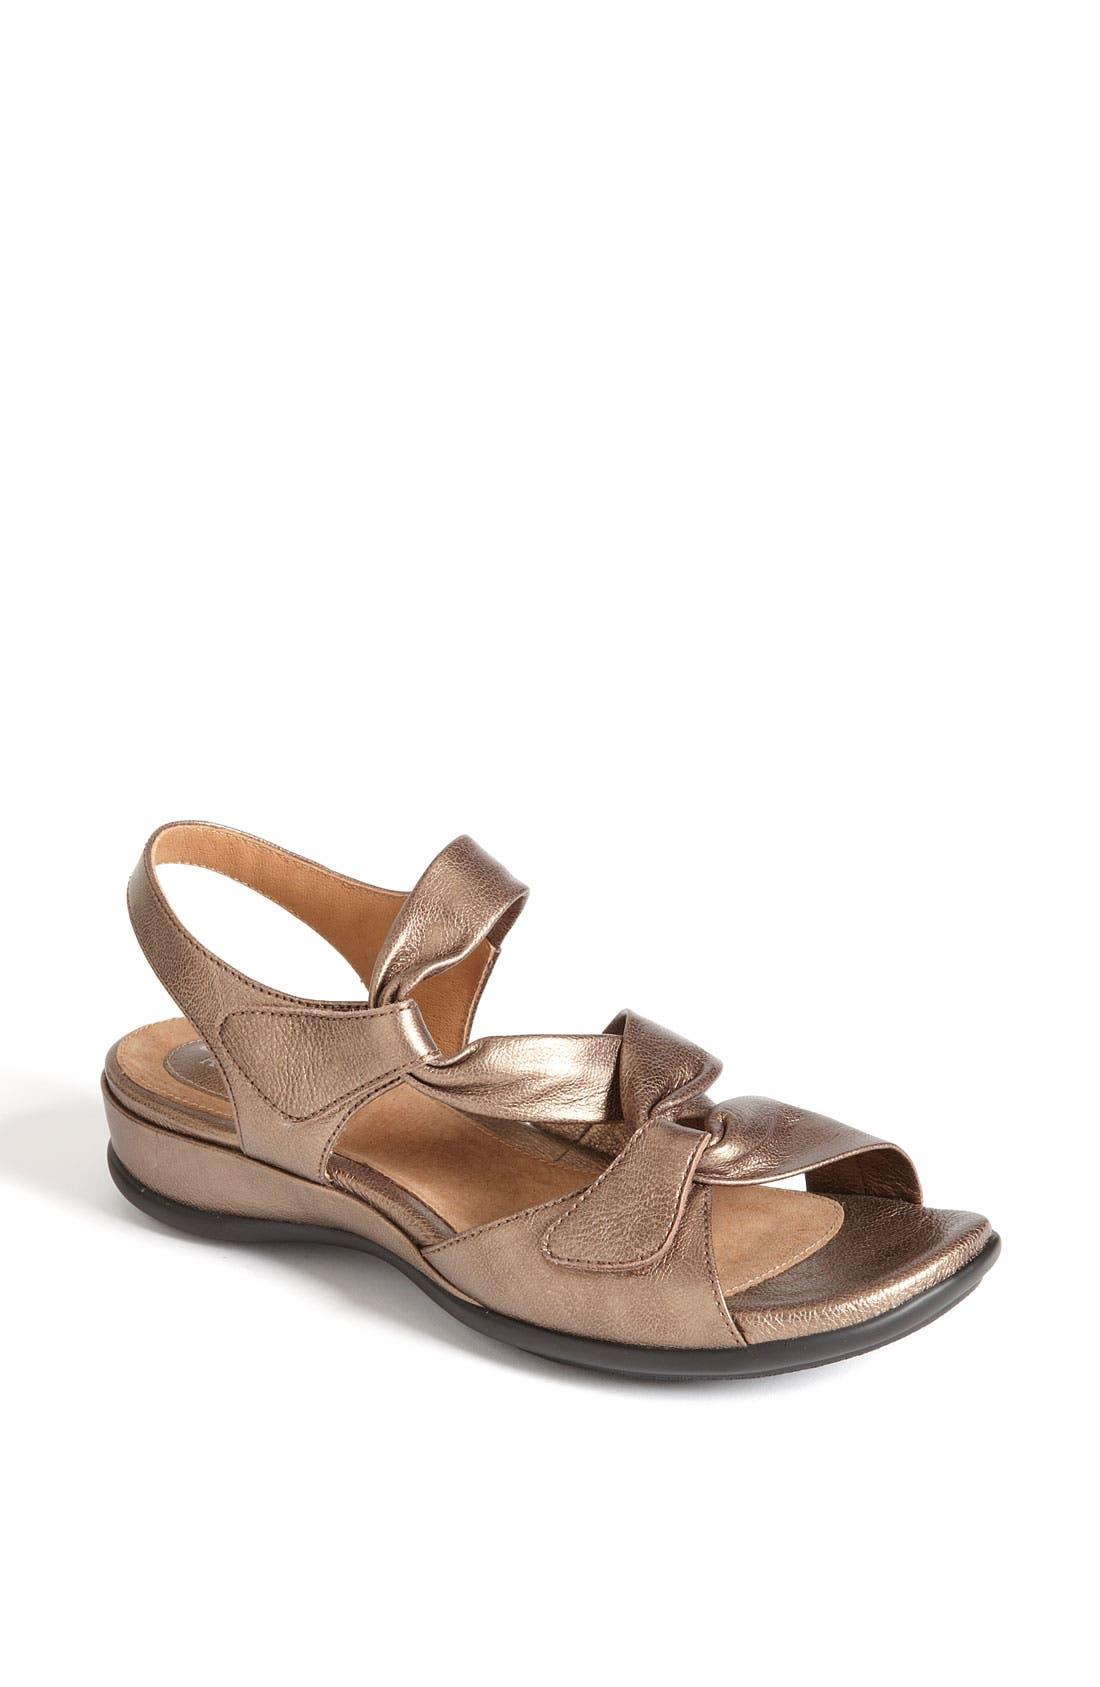 Main Image - Clarks® 'Lucena' Sandal